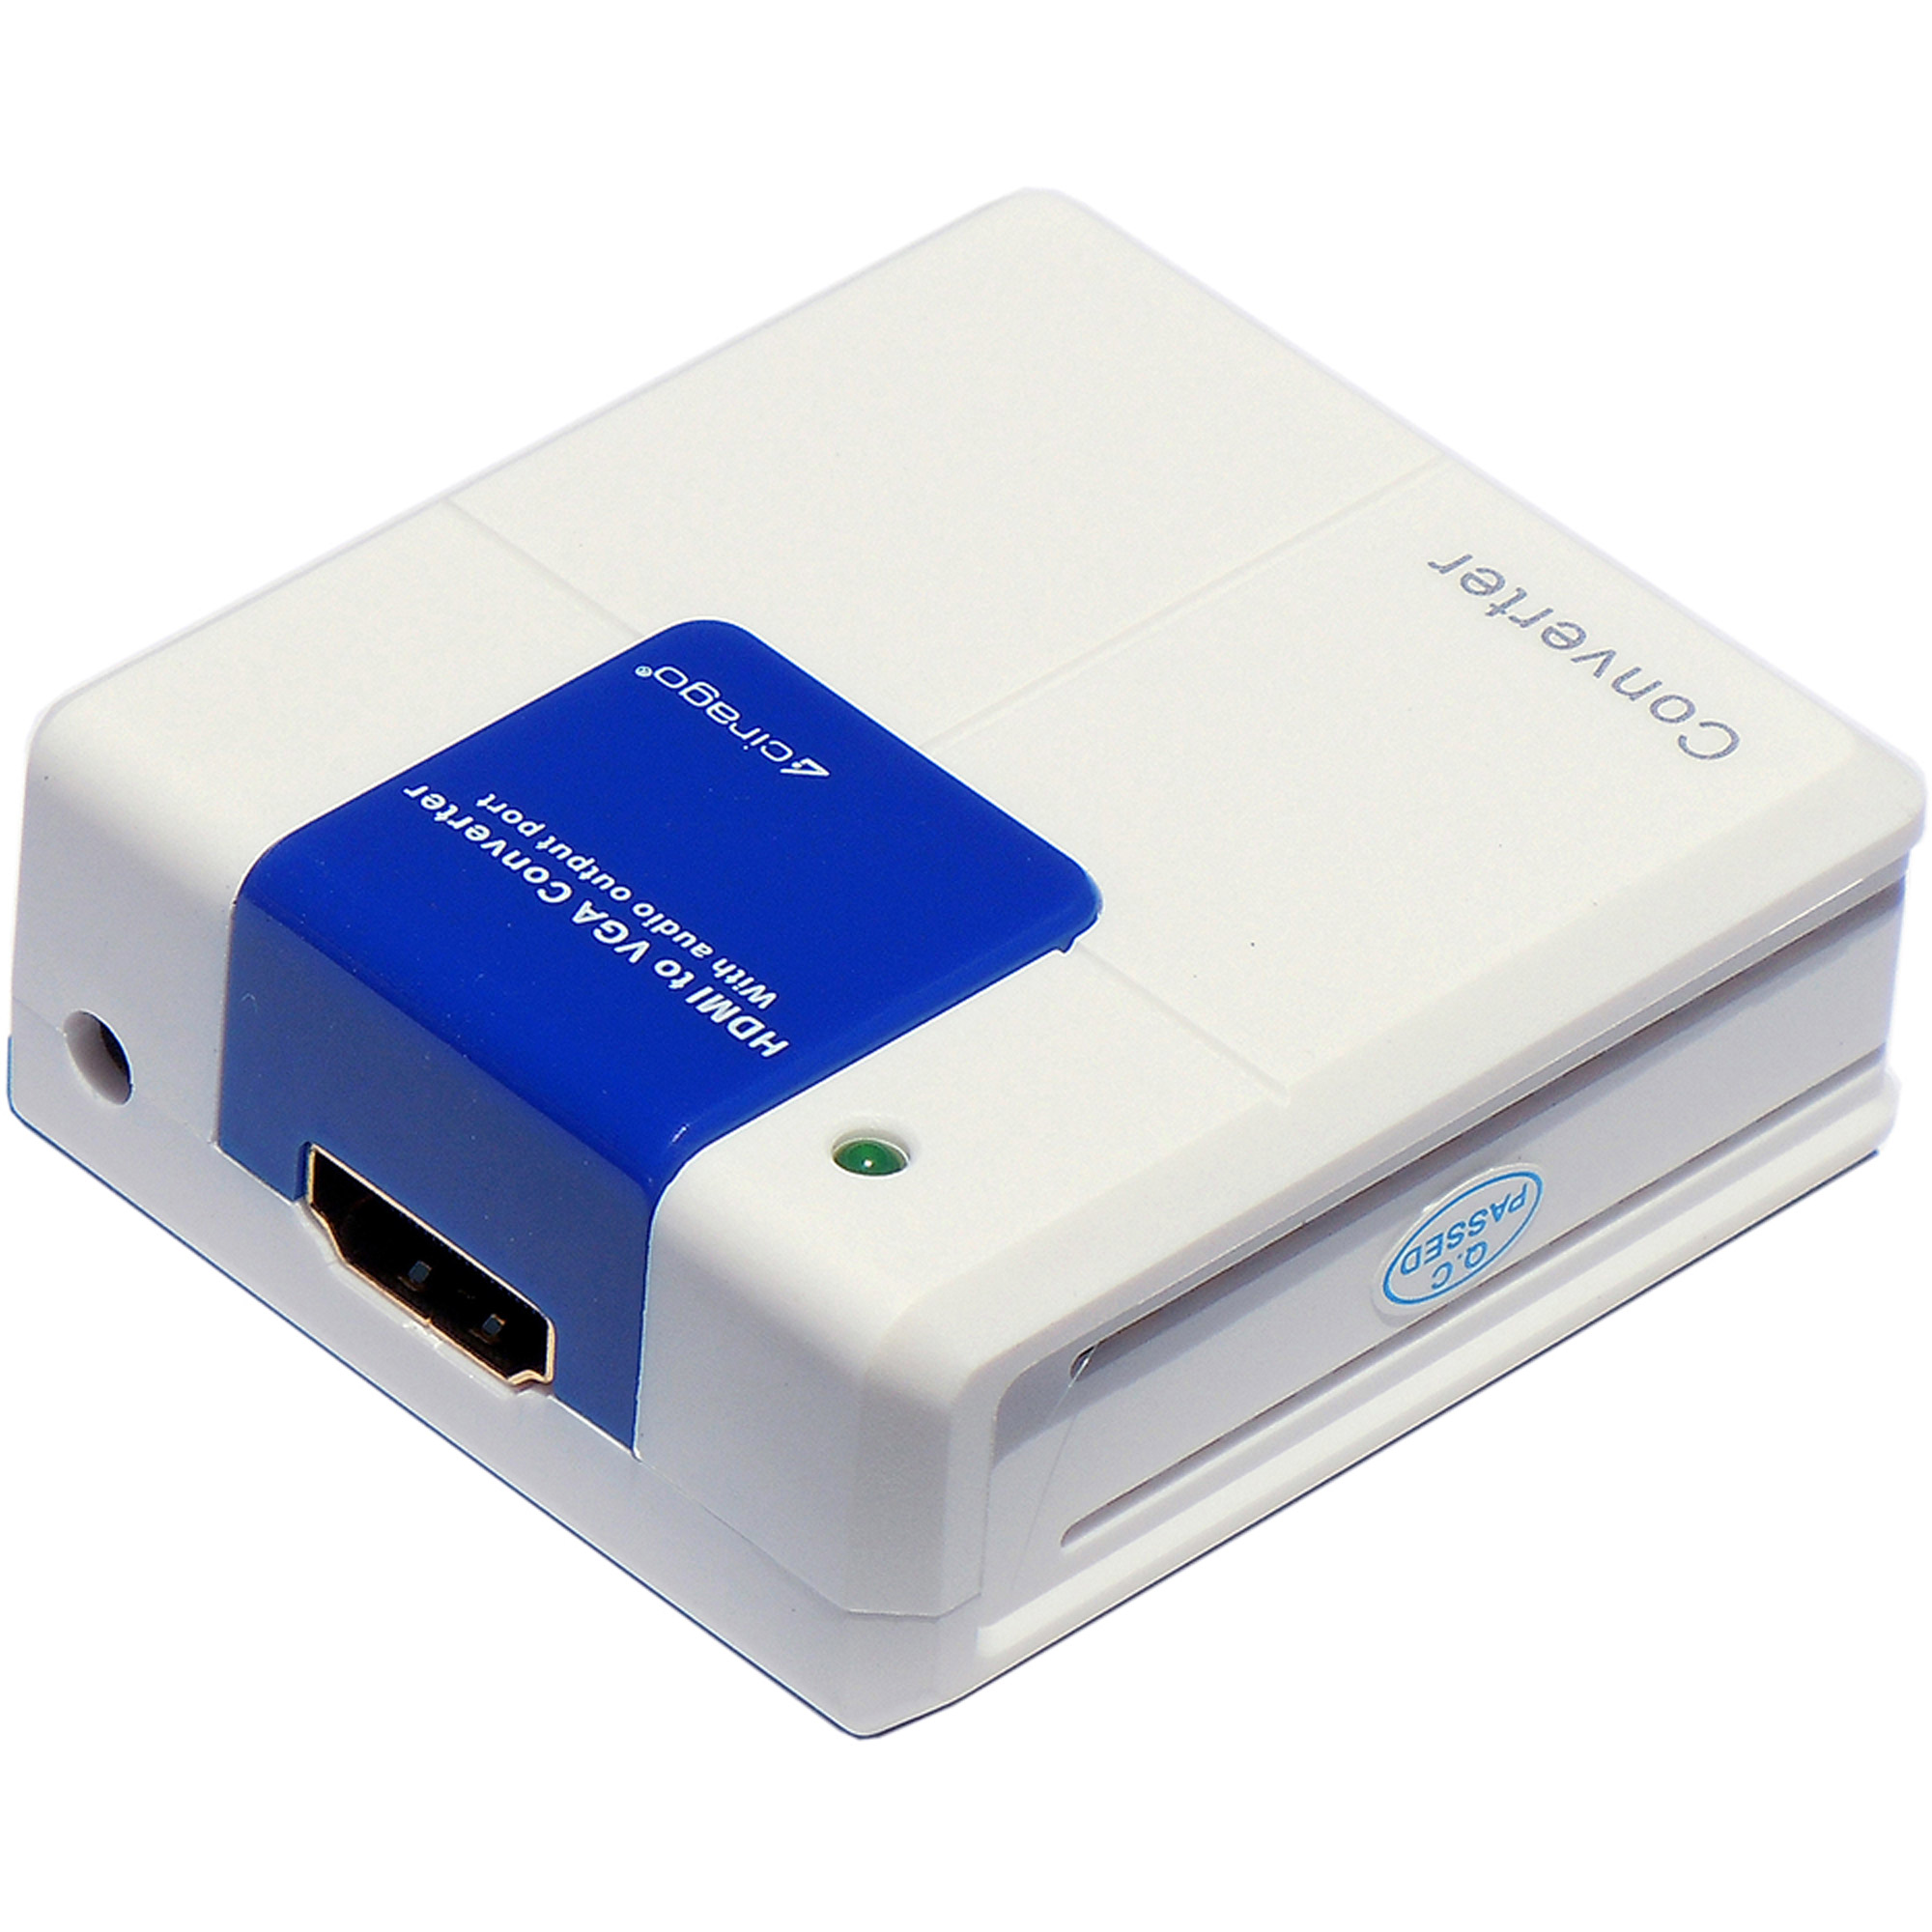 Cirago HDMVGACNVR HDMI to VGA Converter, White